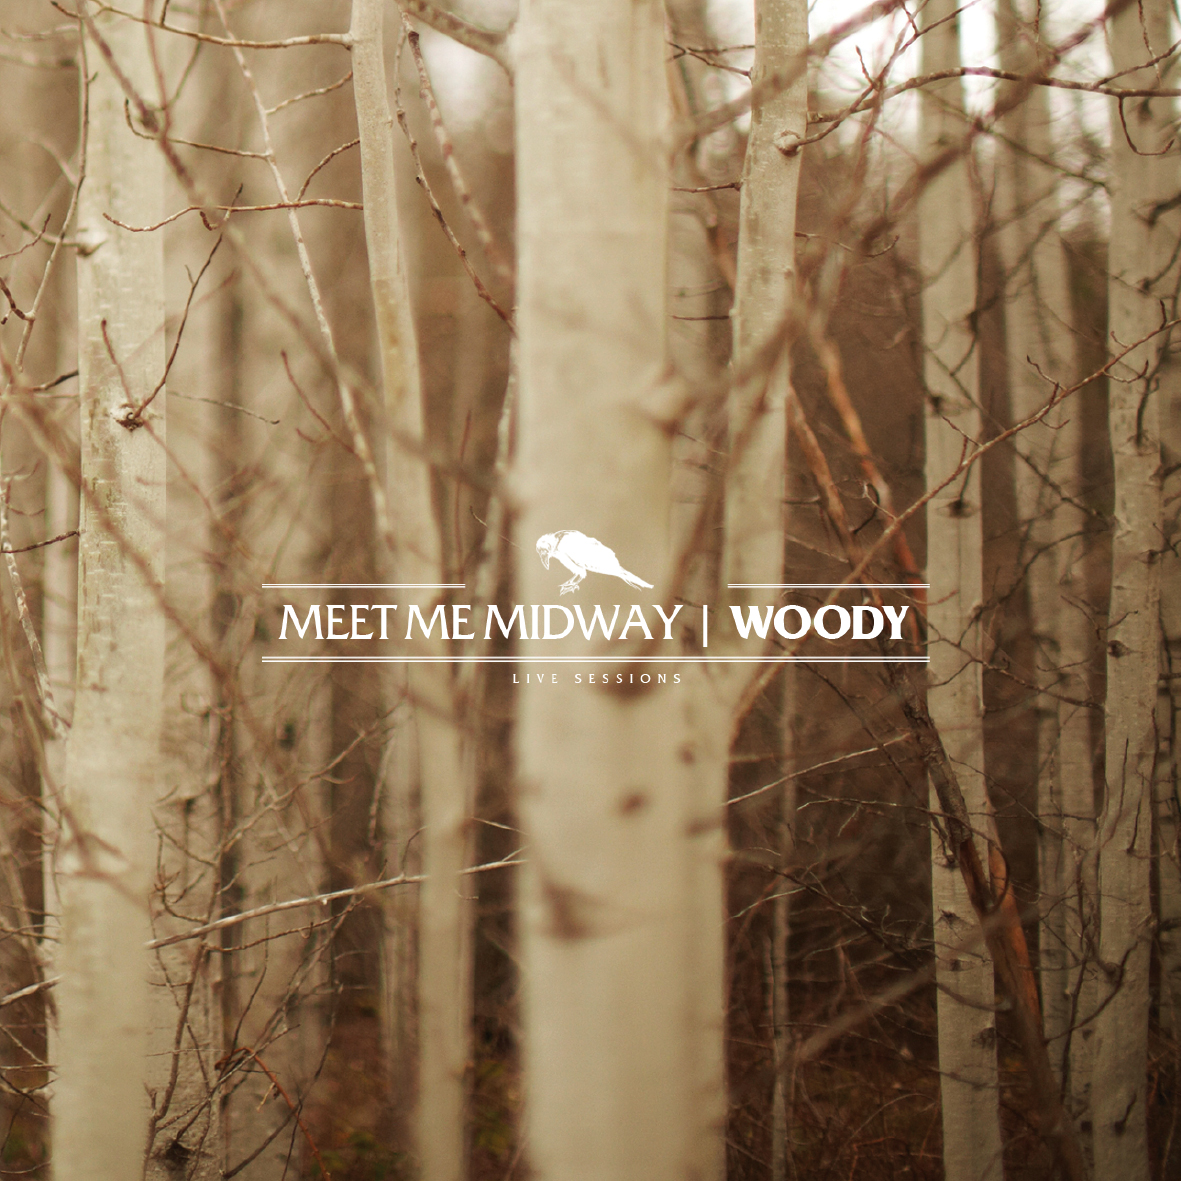 mmm_woody (1)